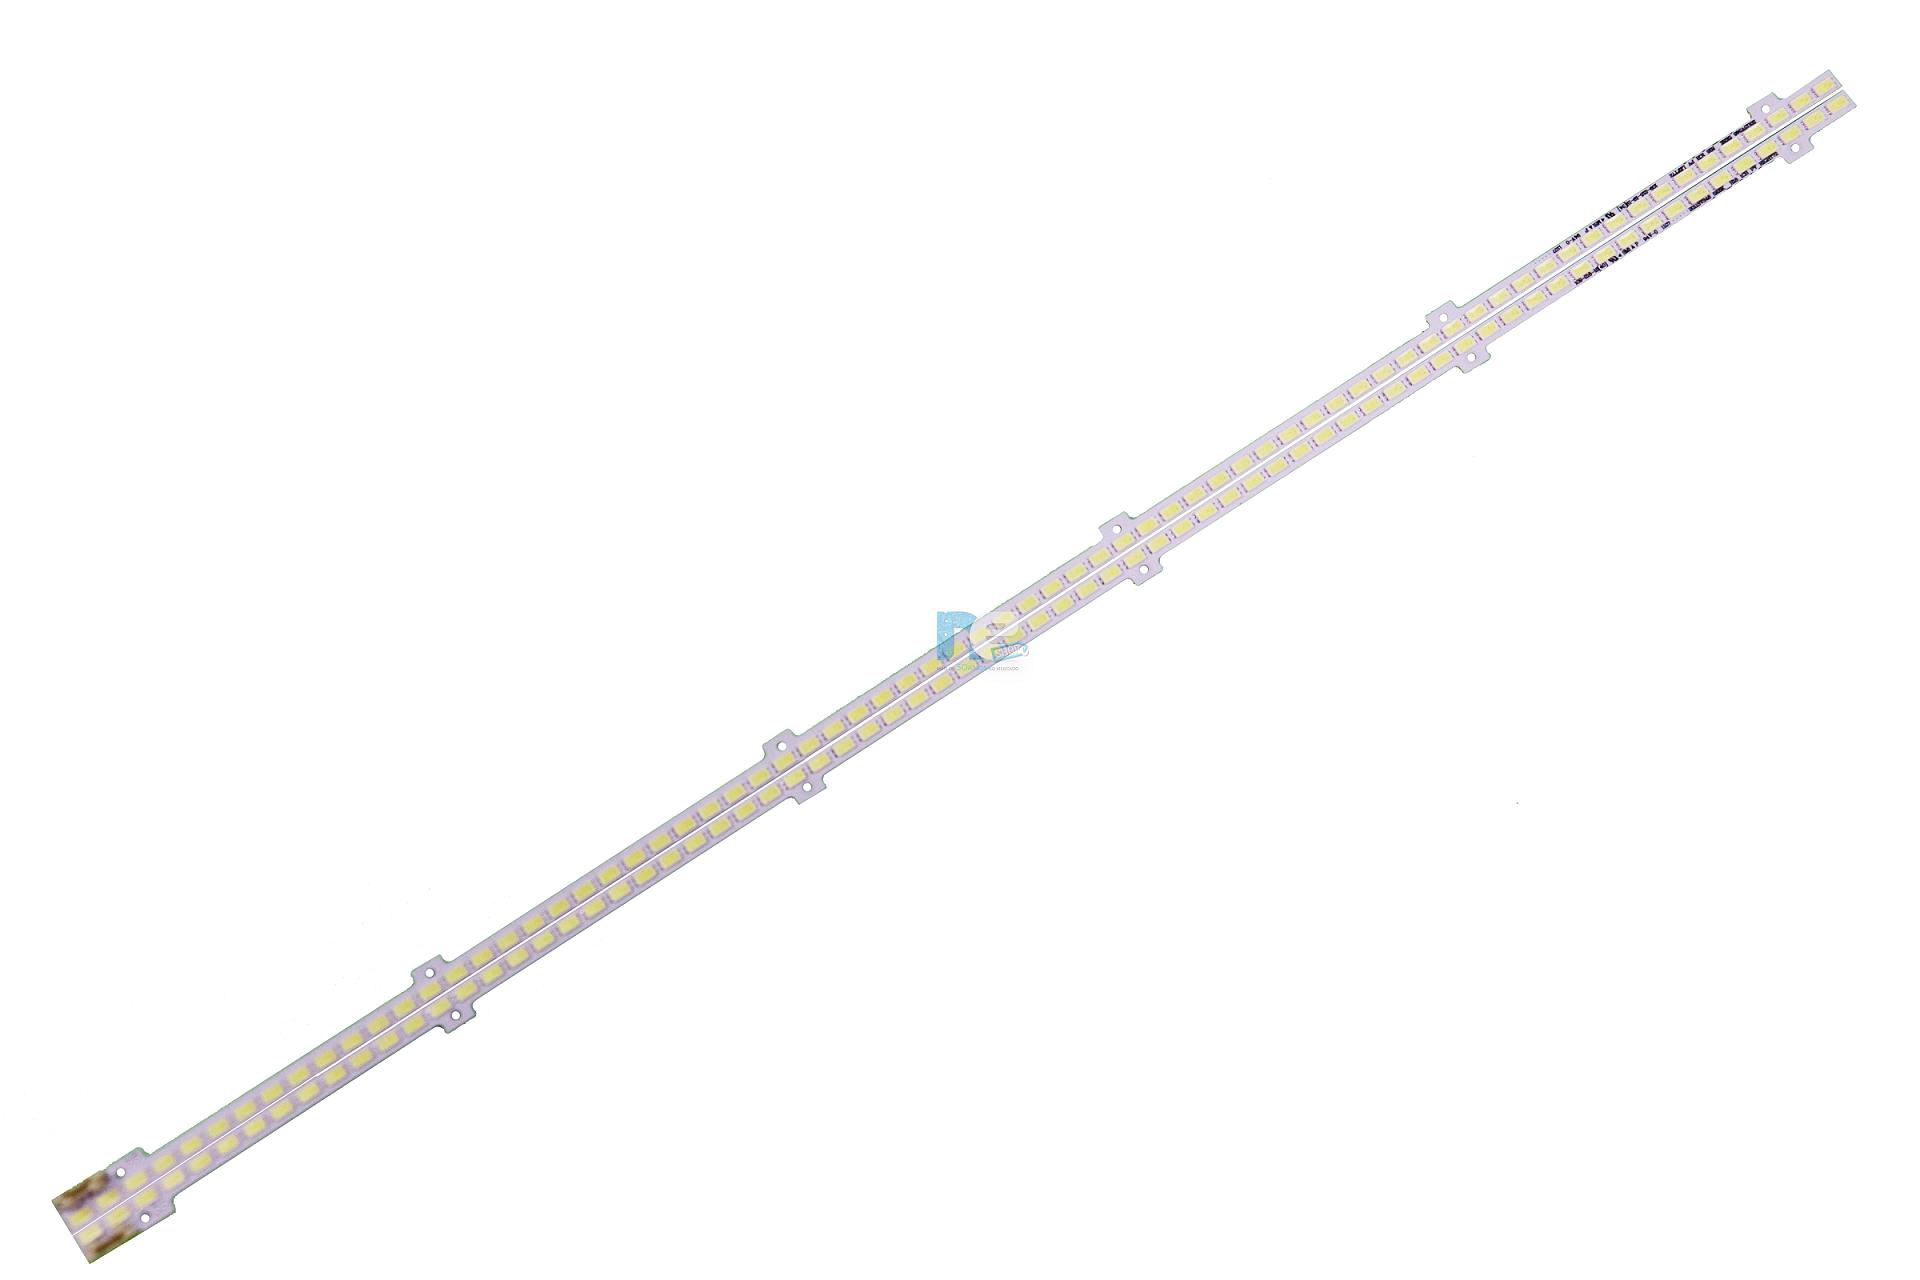 KIT BARRA DE LED SAMSUNG UN46D5500 UN46D5000 UN46D6000 UN46D5800